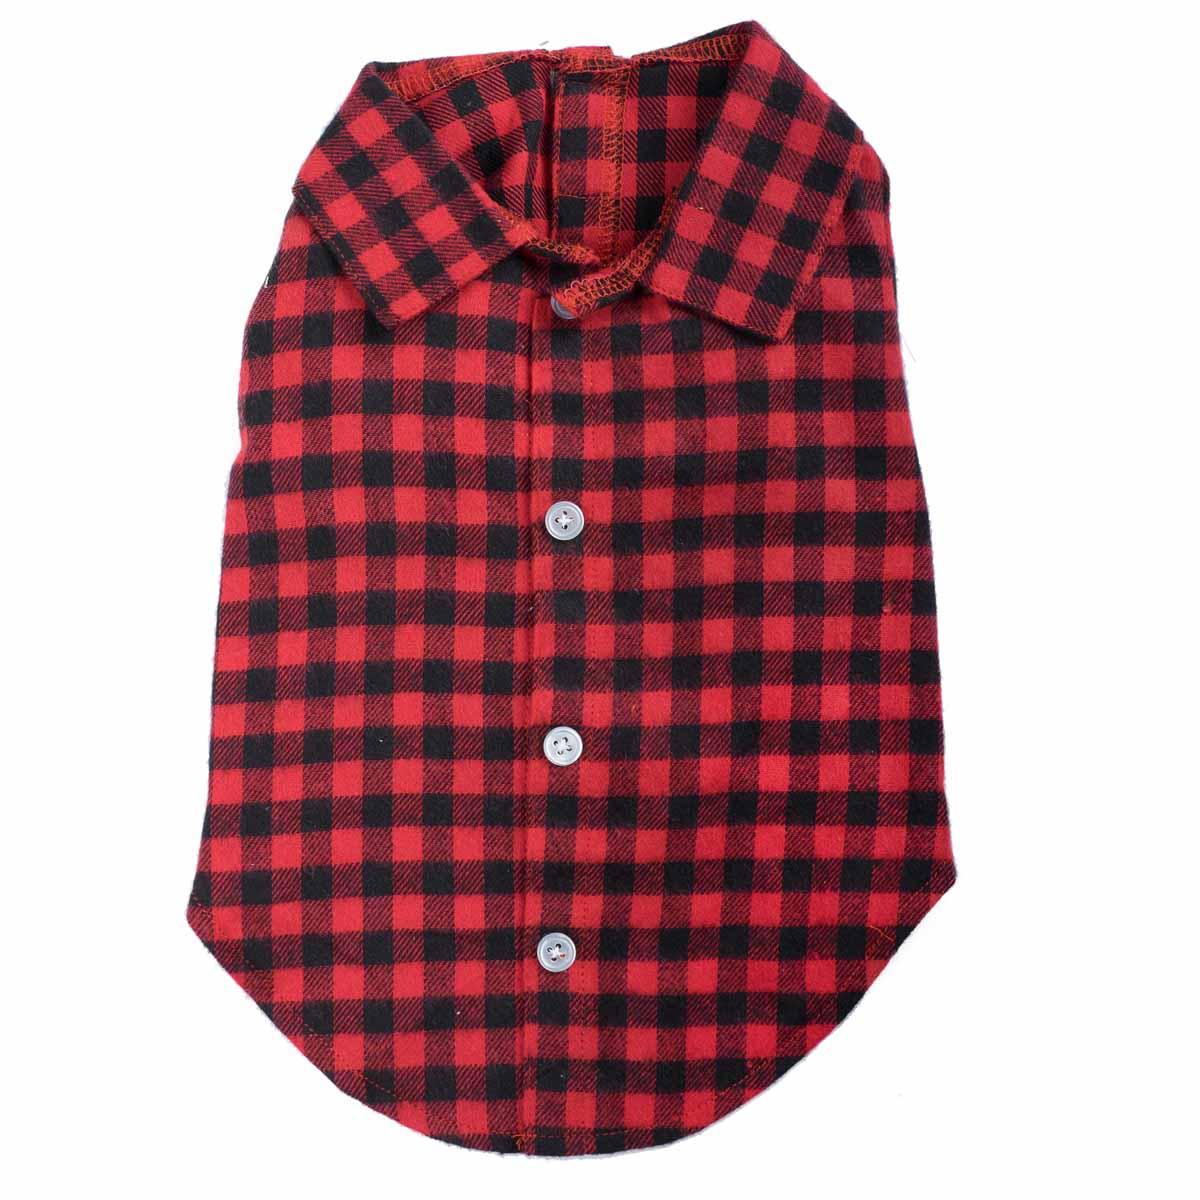 Worthy Dog Buffalo Plaid Dog Shirt